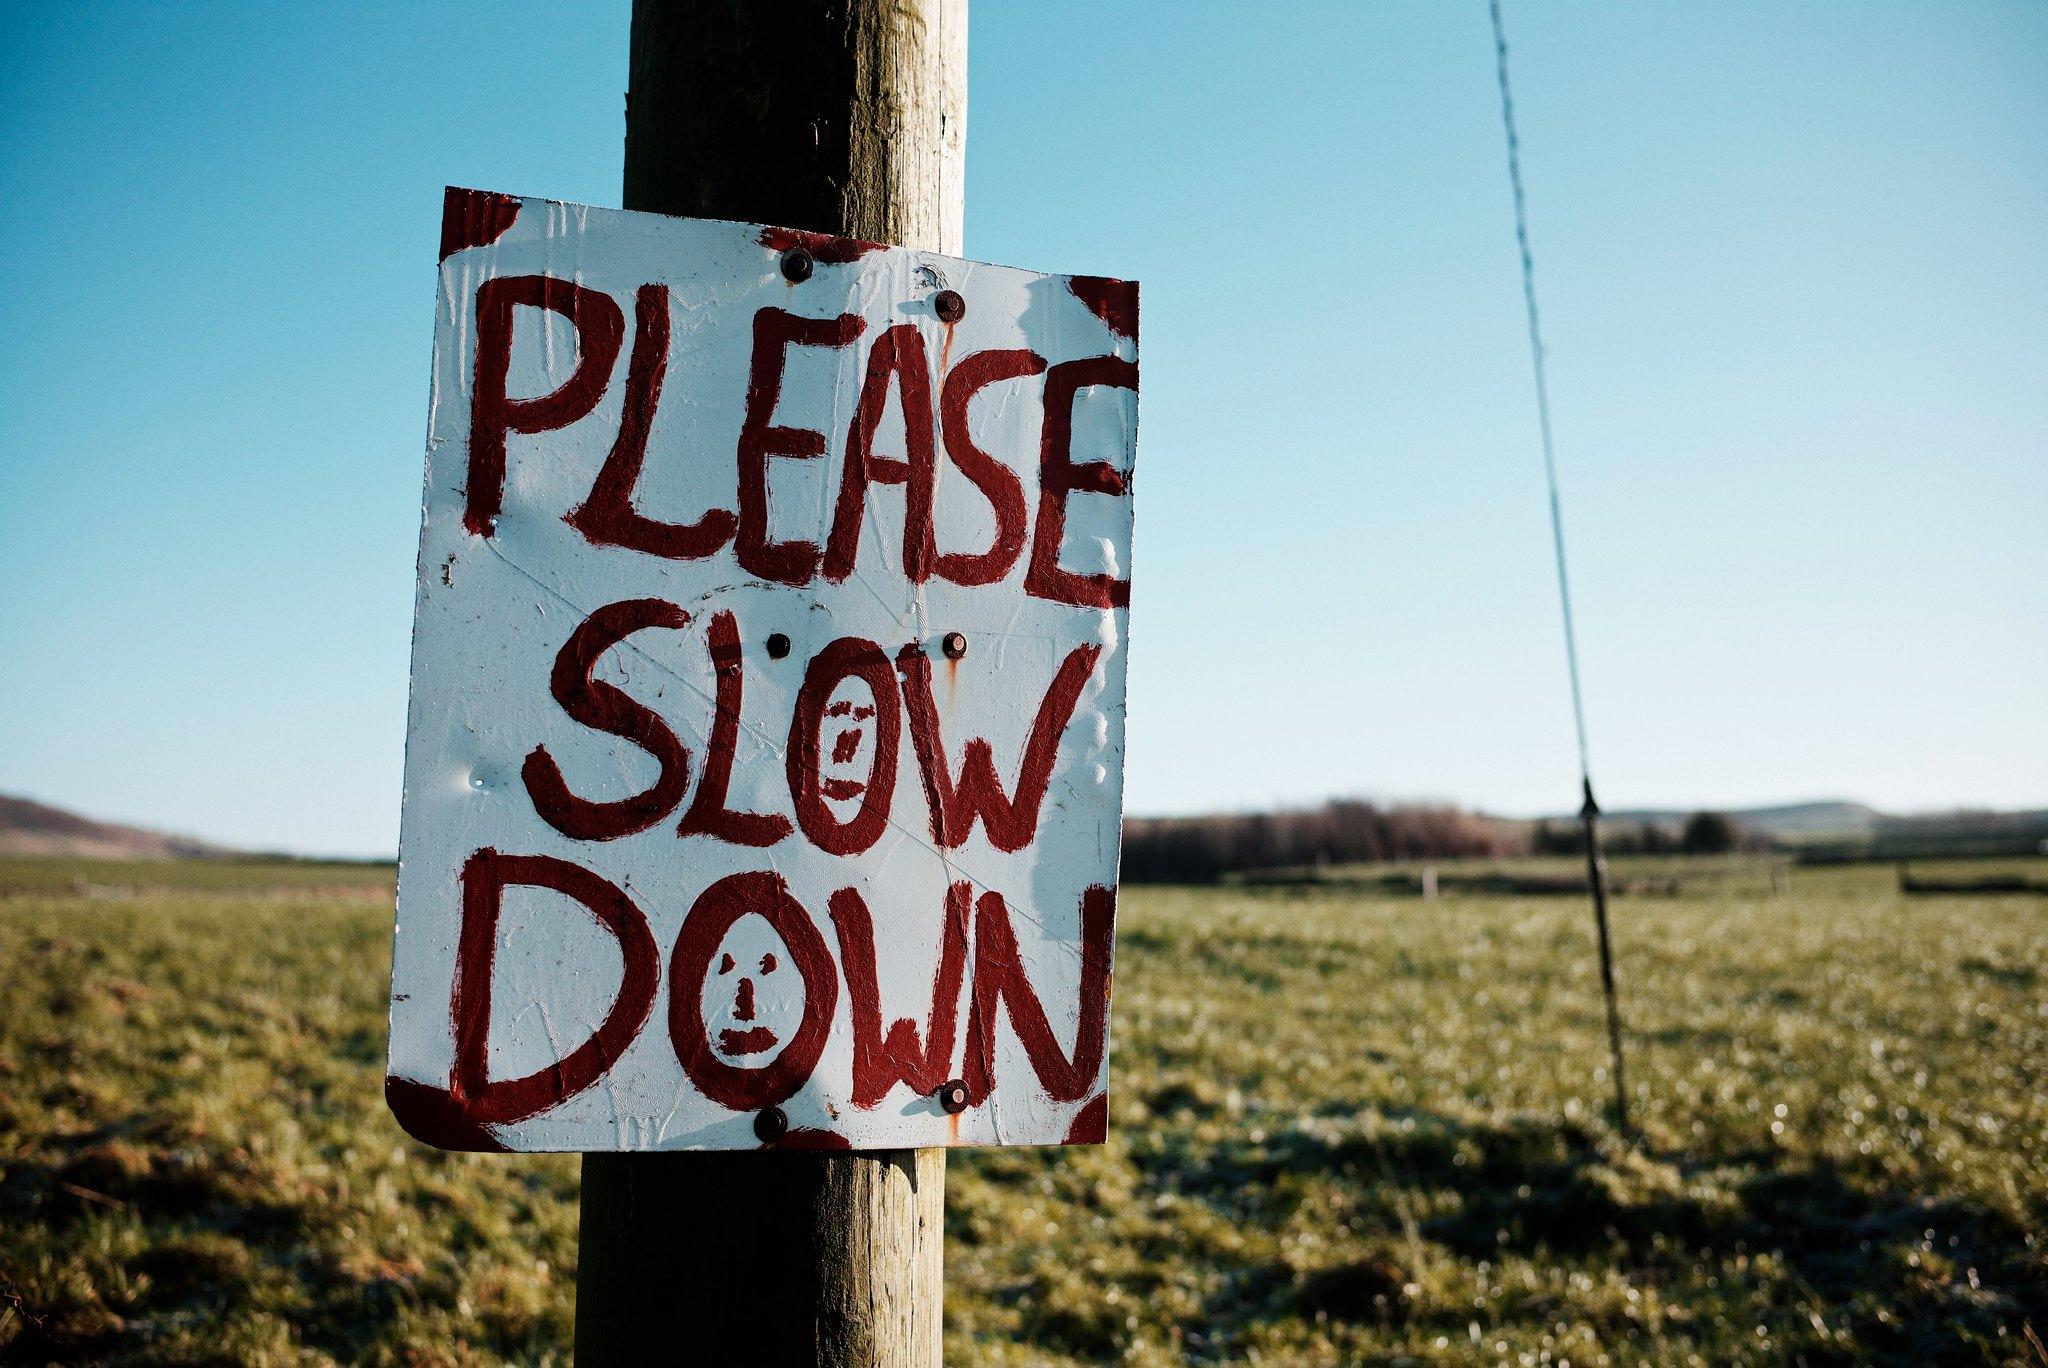 200512 - Please Slow Down by John Reynolds CC BY-NC-ND 2.0 - La Déviation